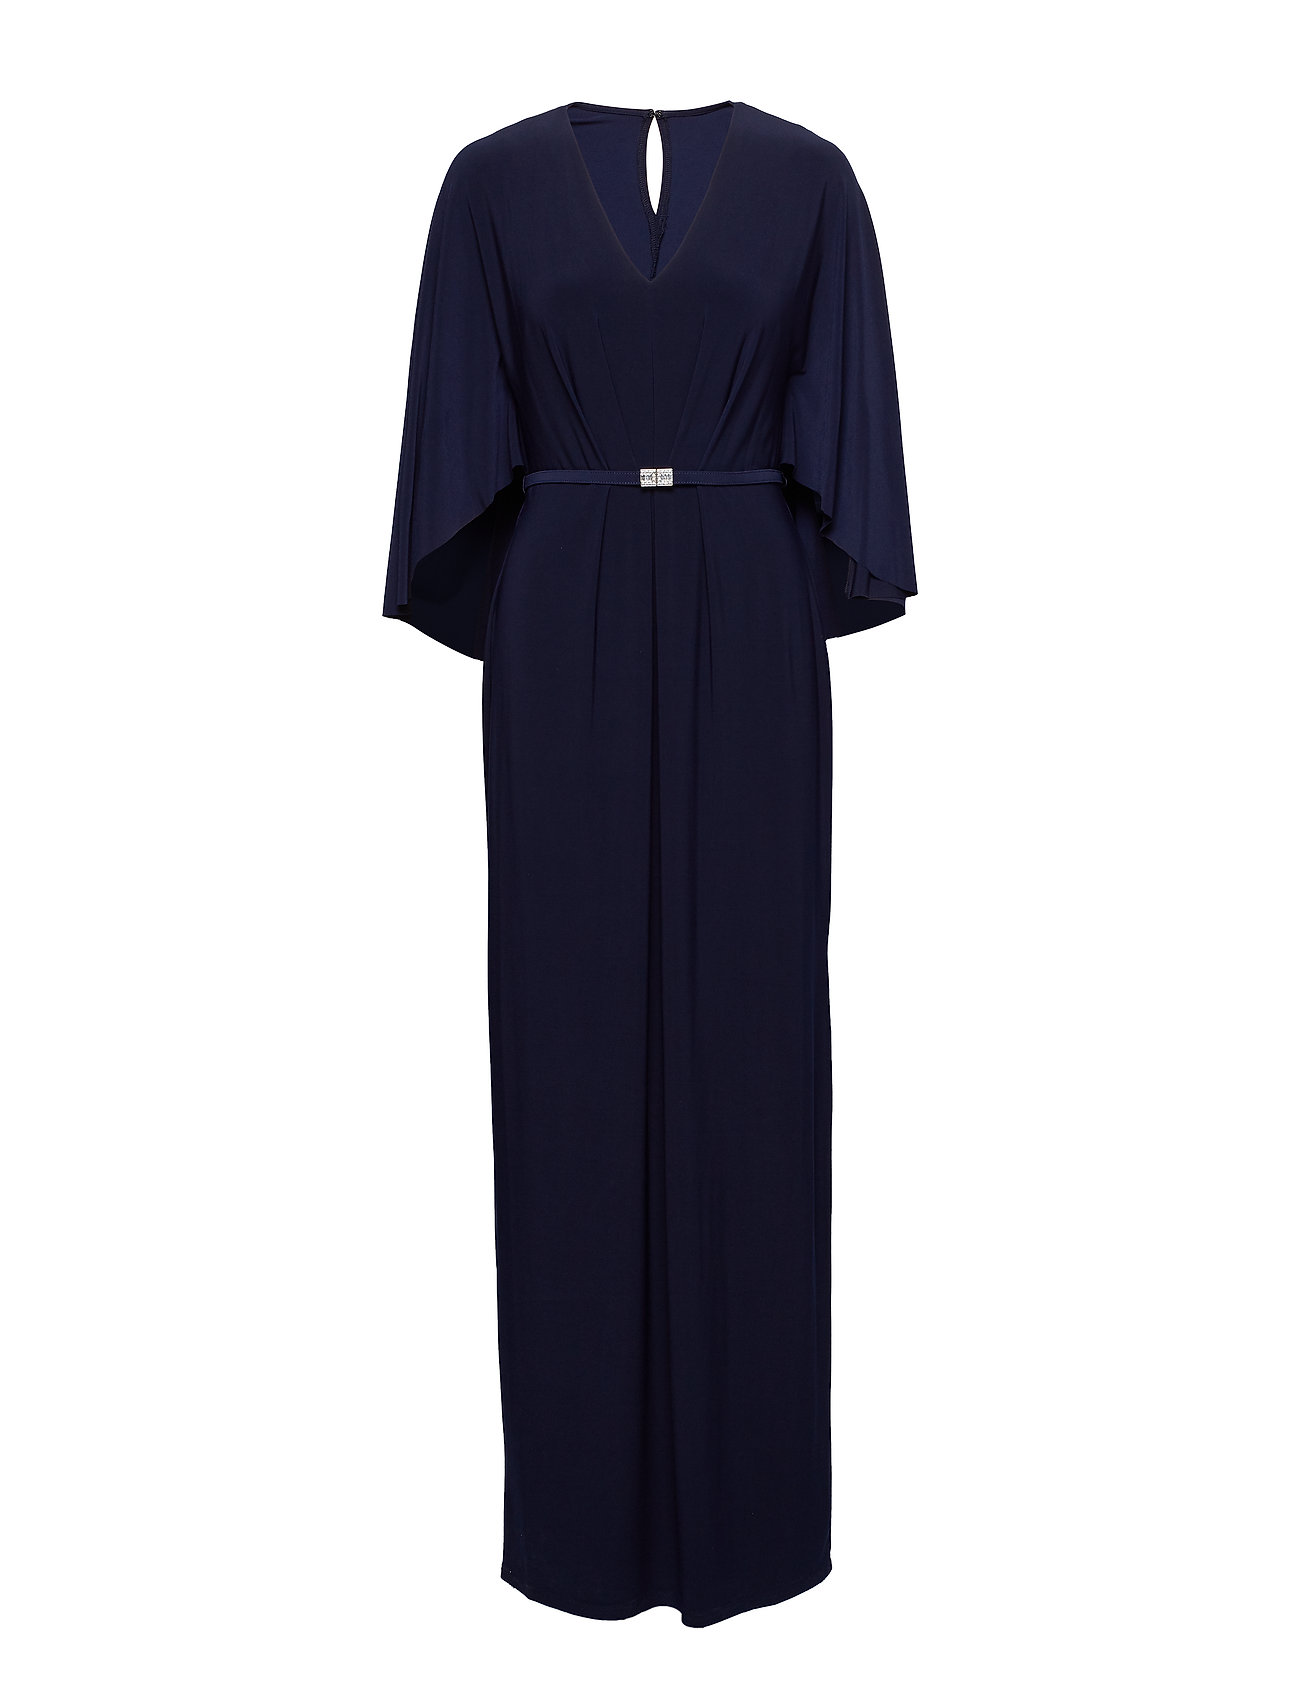 Lauren Ralph Lauren Belted Cape Jersey Gown - LIGHTHOUSE NAVY